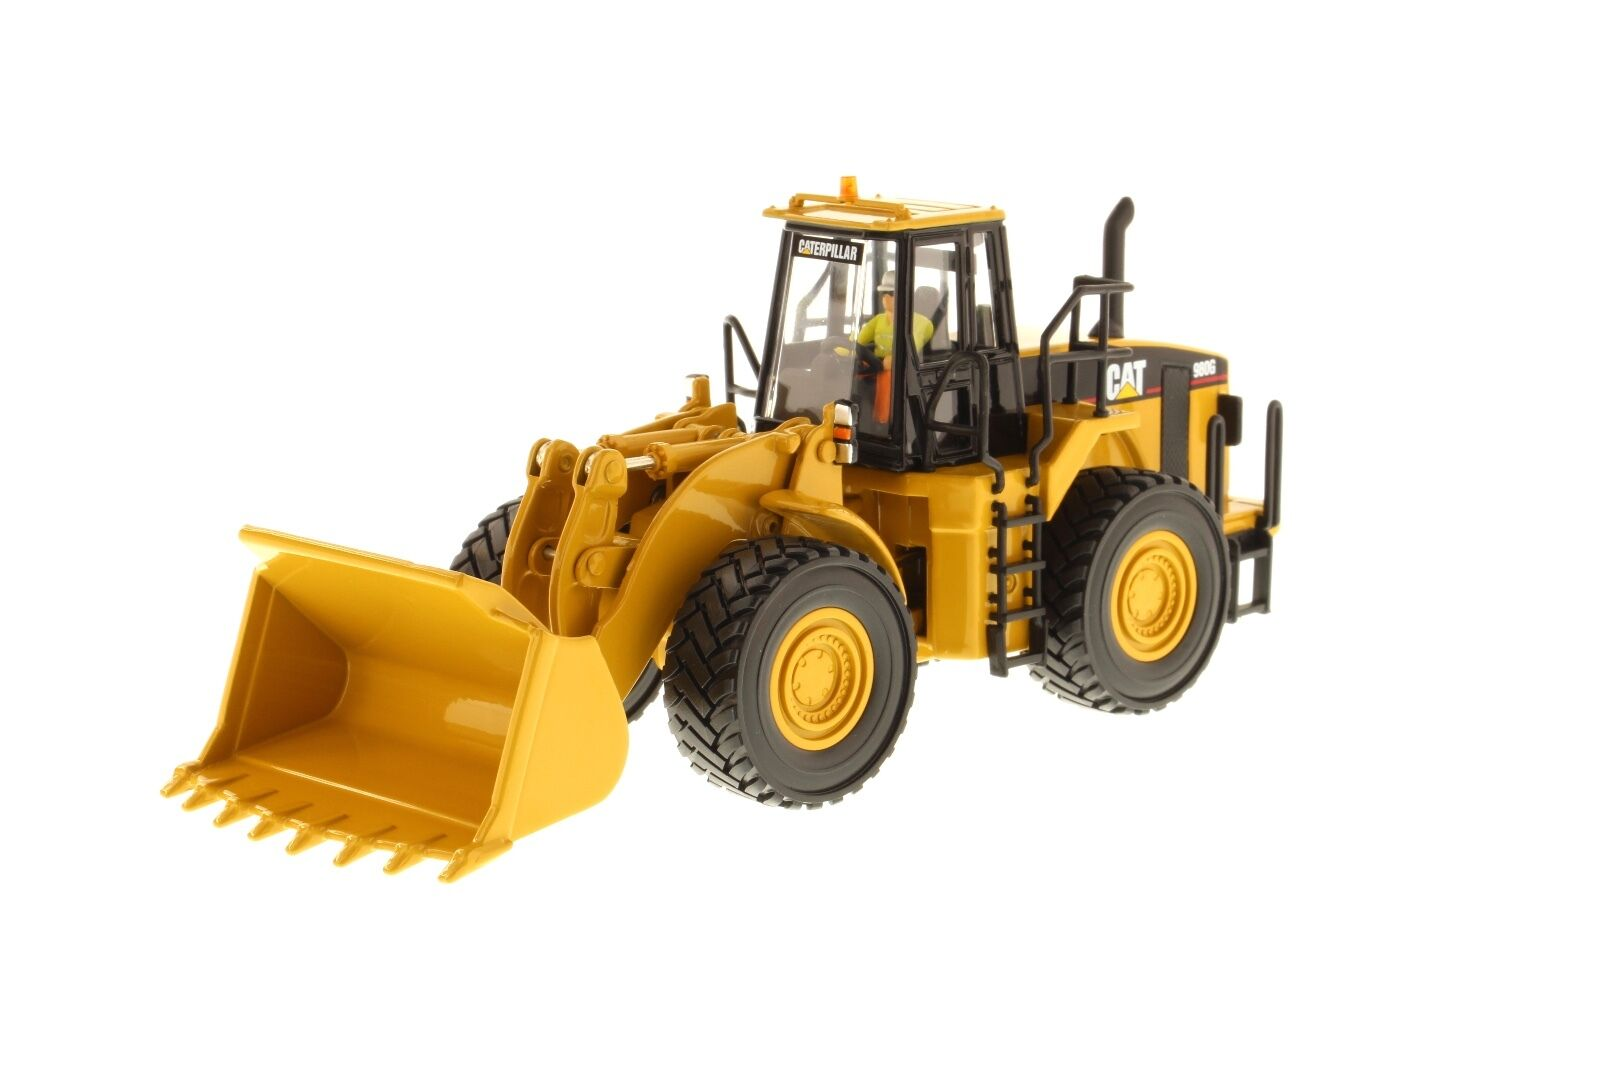 Caterpillar ® 1 50 Escala Cat 980G Rueda Cochegador-Diecast Masters 85027